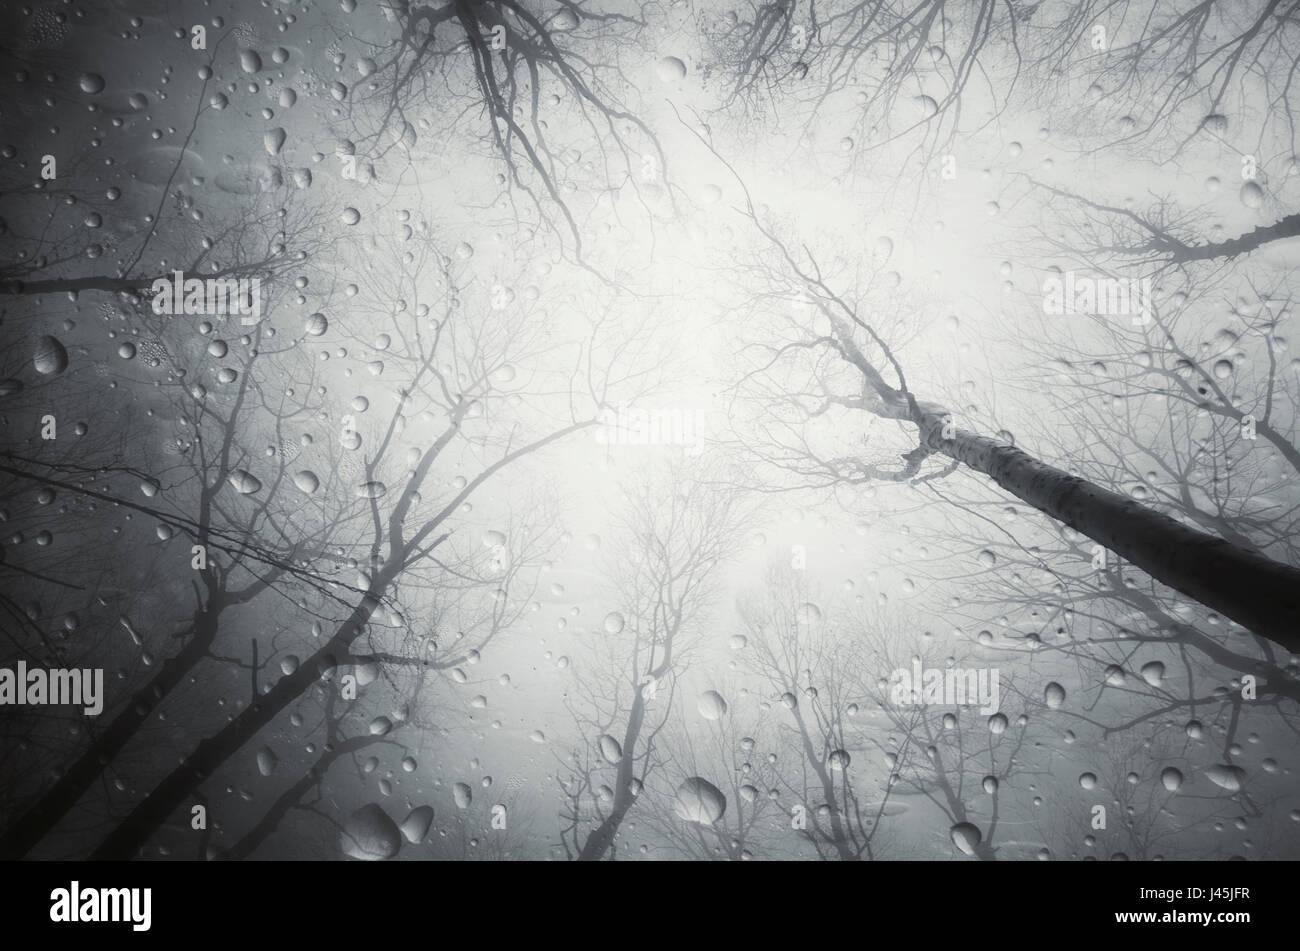 rain drops in dark forest landscape - Stock Image